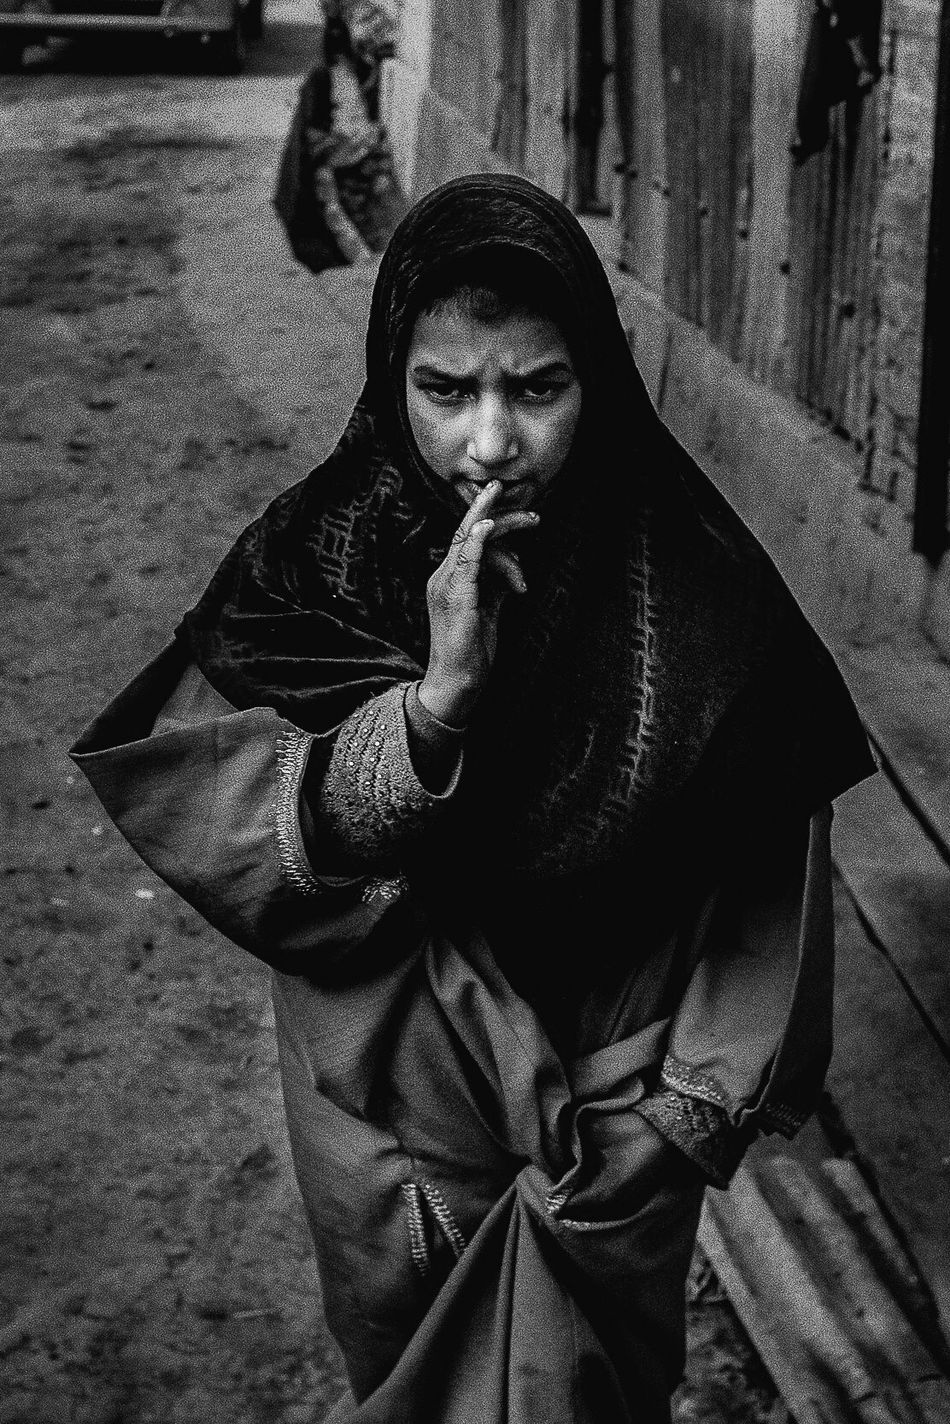 Kashmir 2016 © Zacharie Rabehi / Agence Le Journal